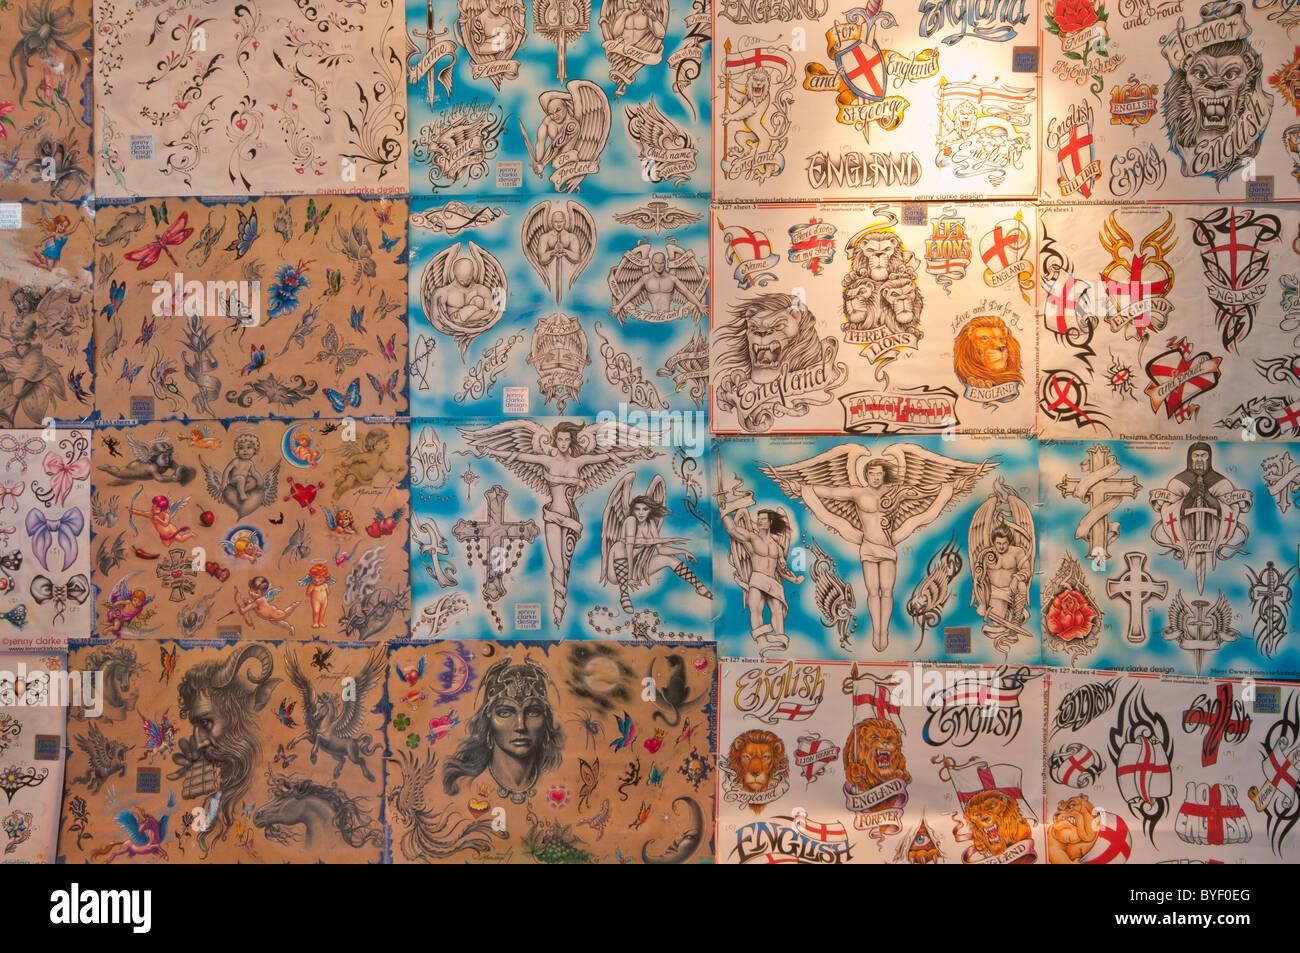 Tattoo Display On A Wall Of A Tattoo Studio - Stock Image